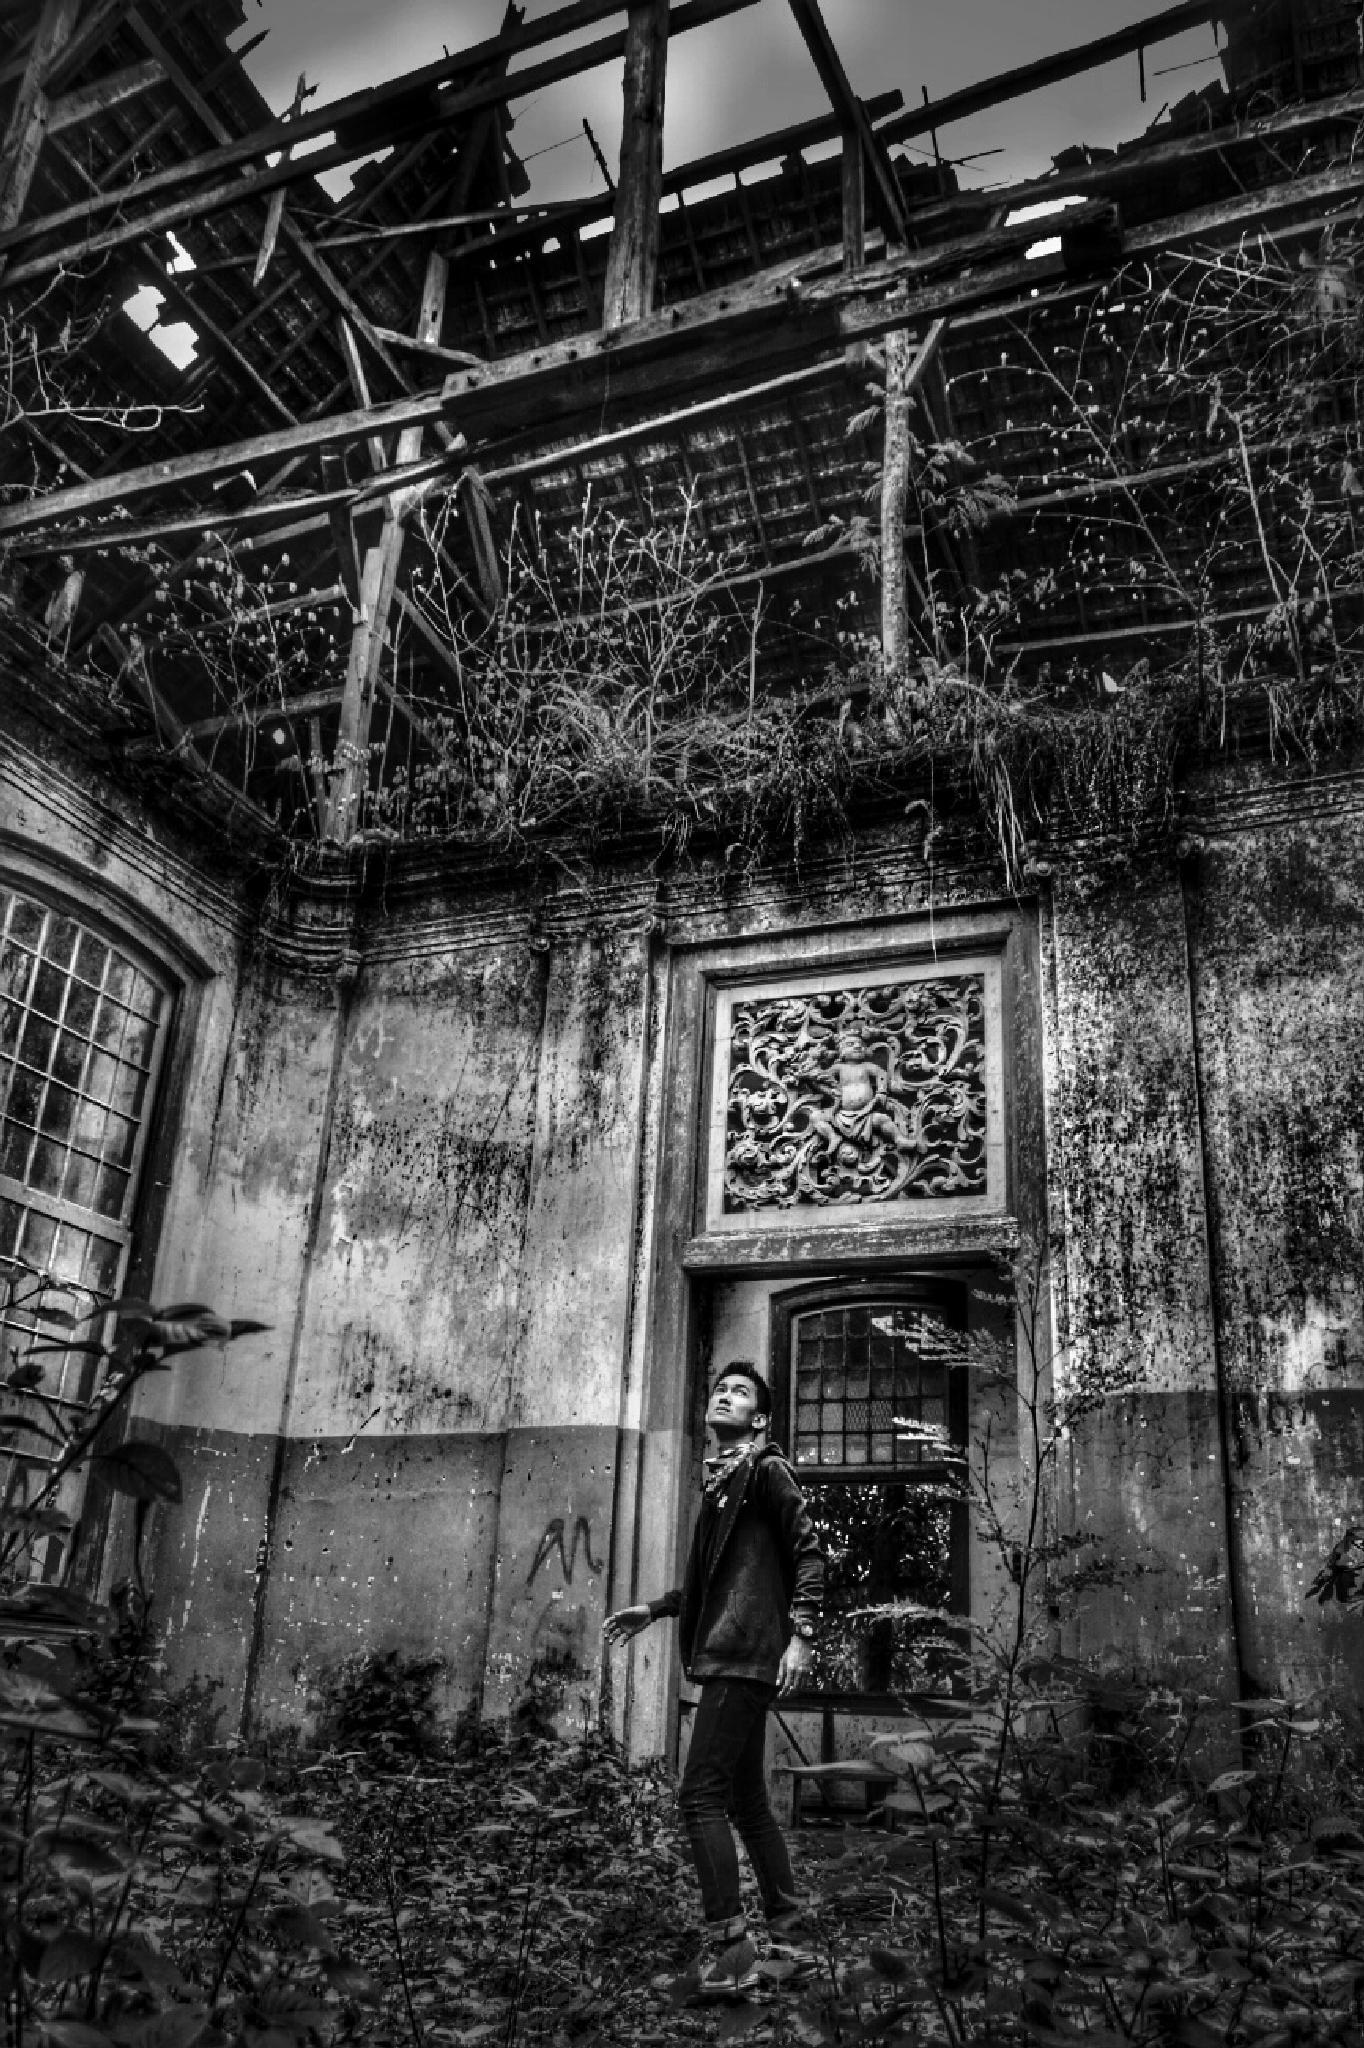 nightmare by Shaeful Muad